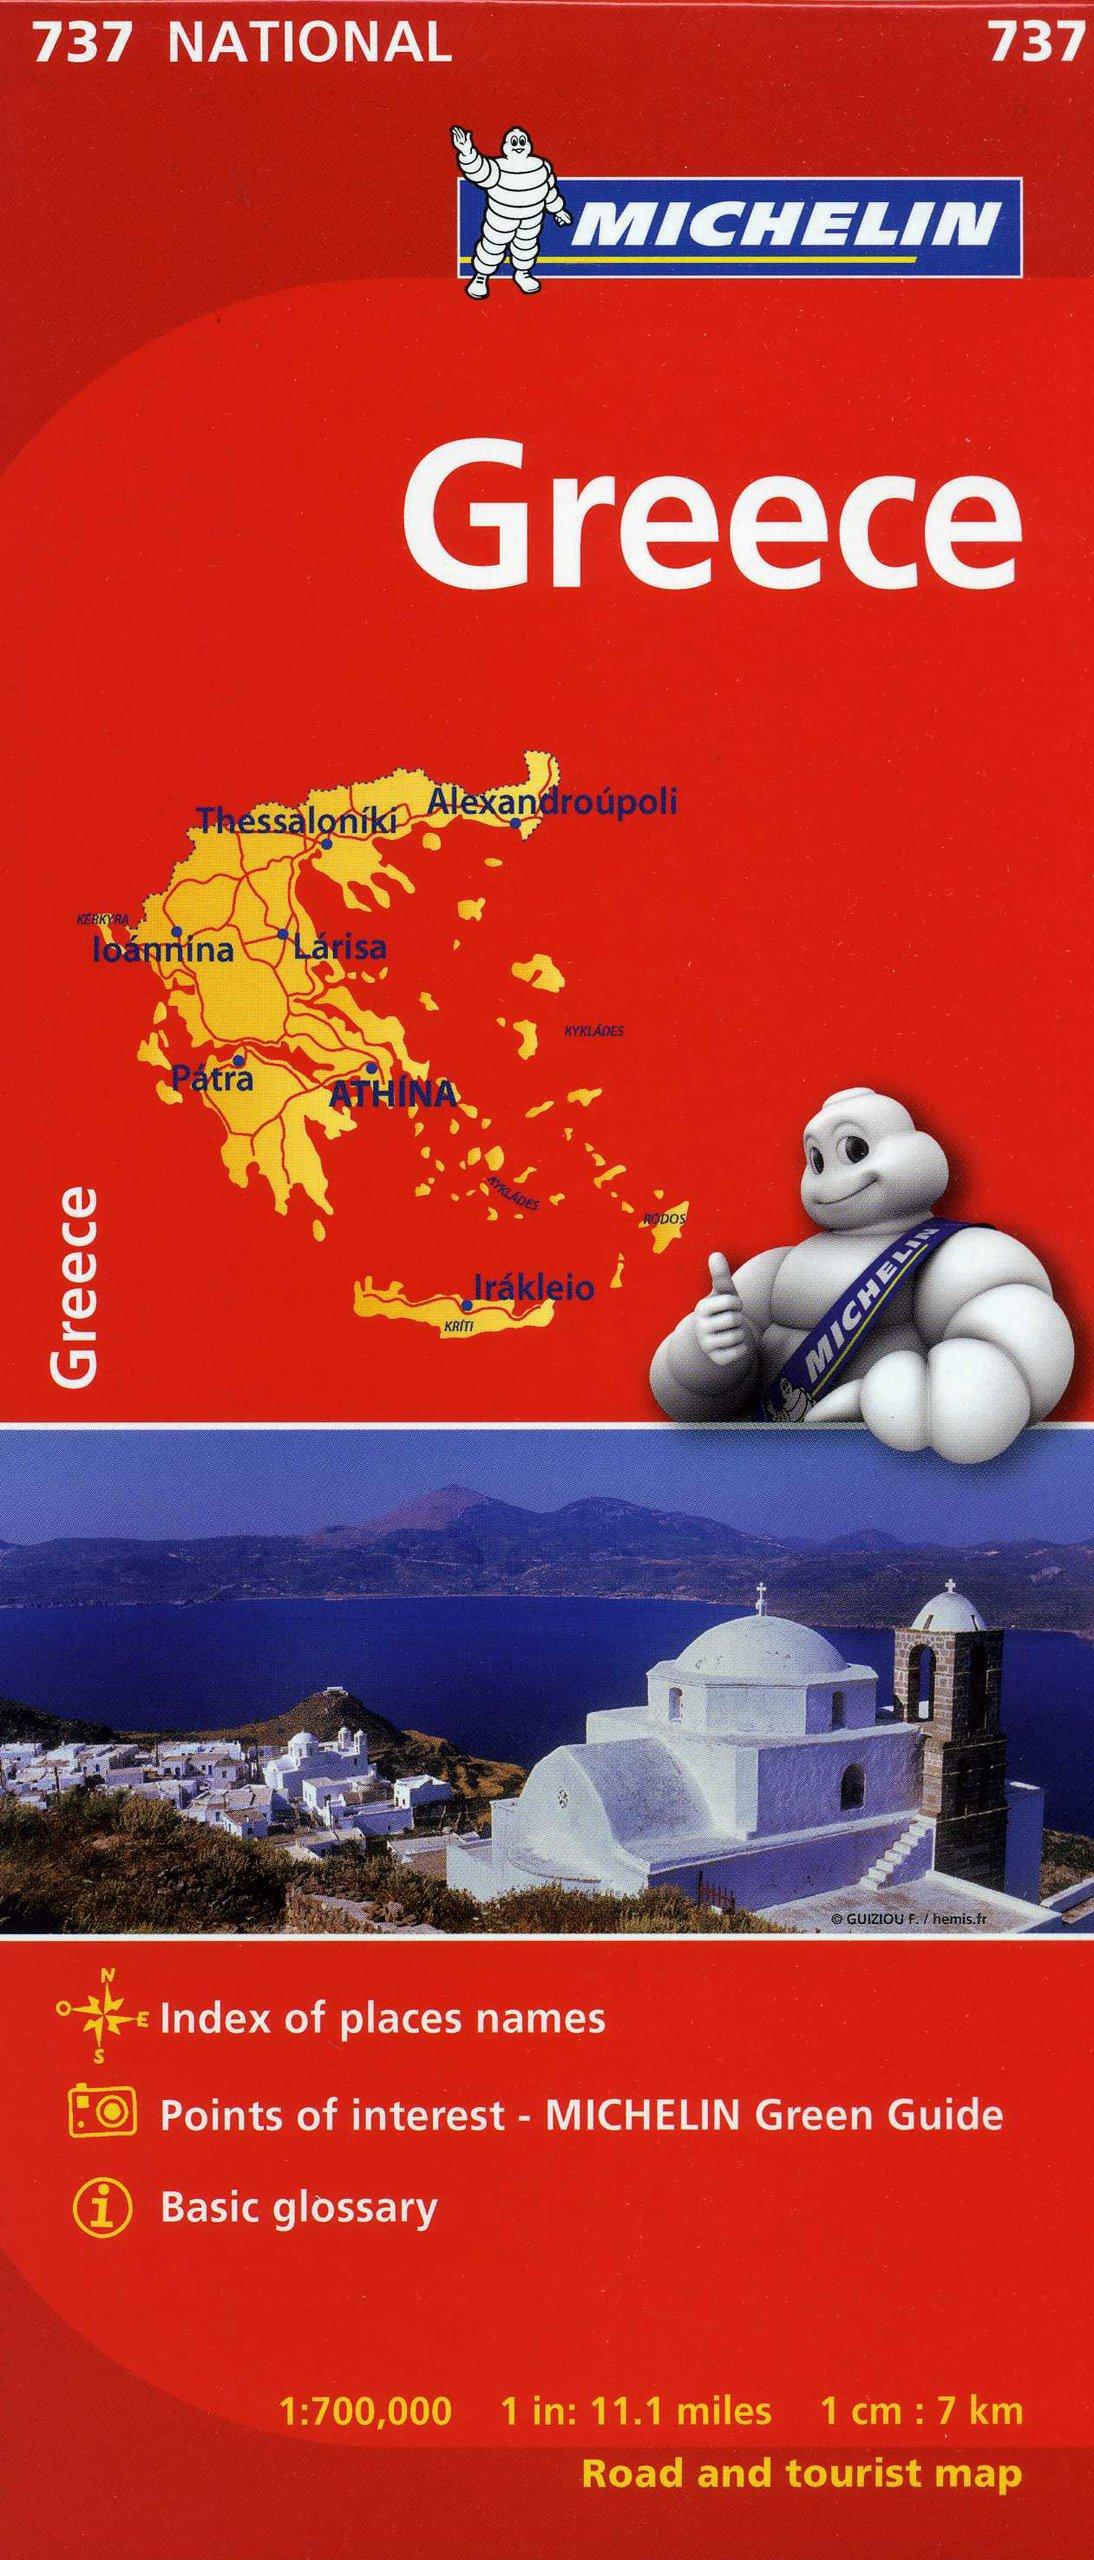 Carte Croatie Lonely Planet.Grece 737 Carte Nat Collectif 9782067172012 Books